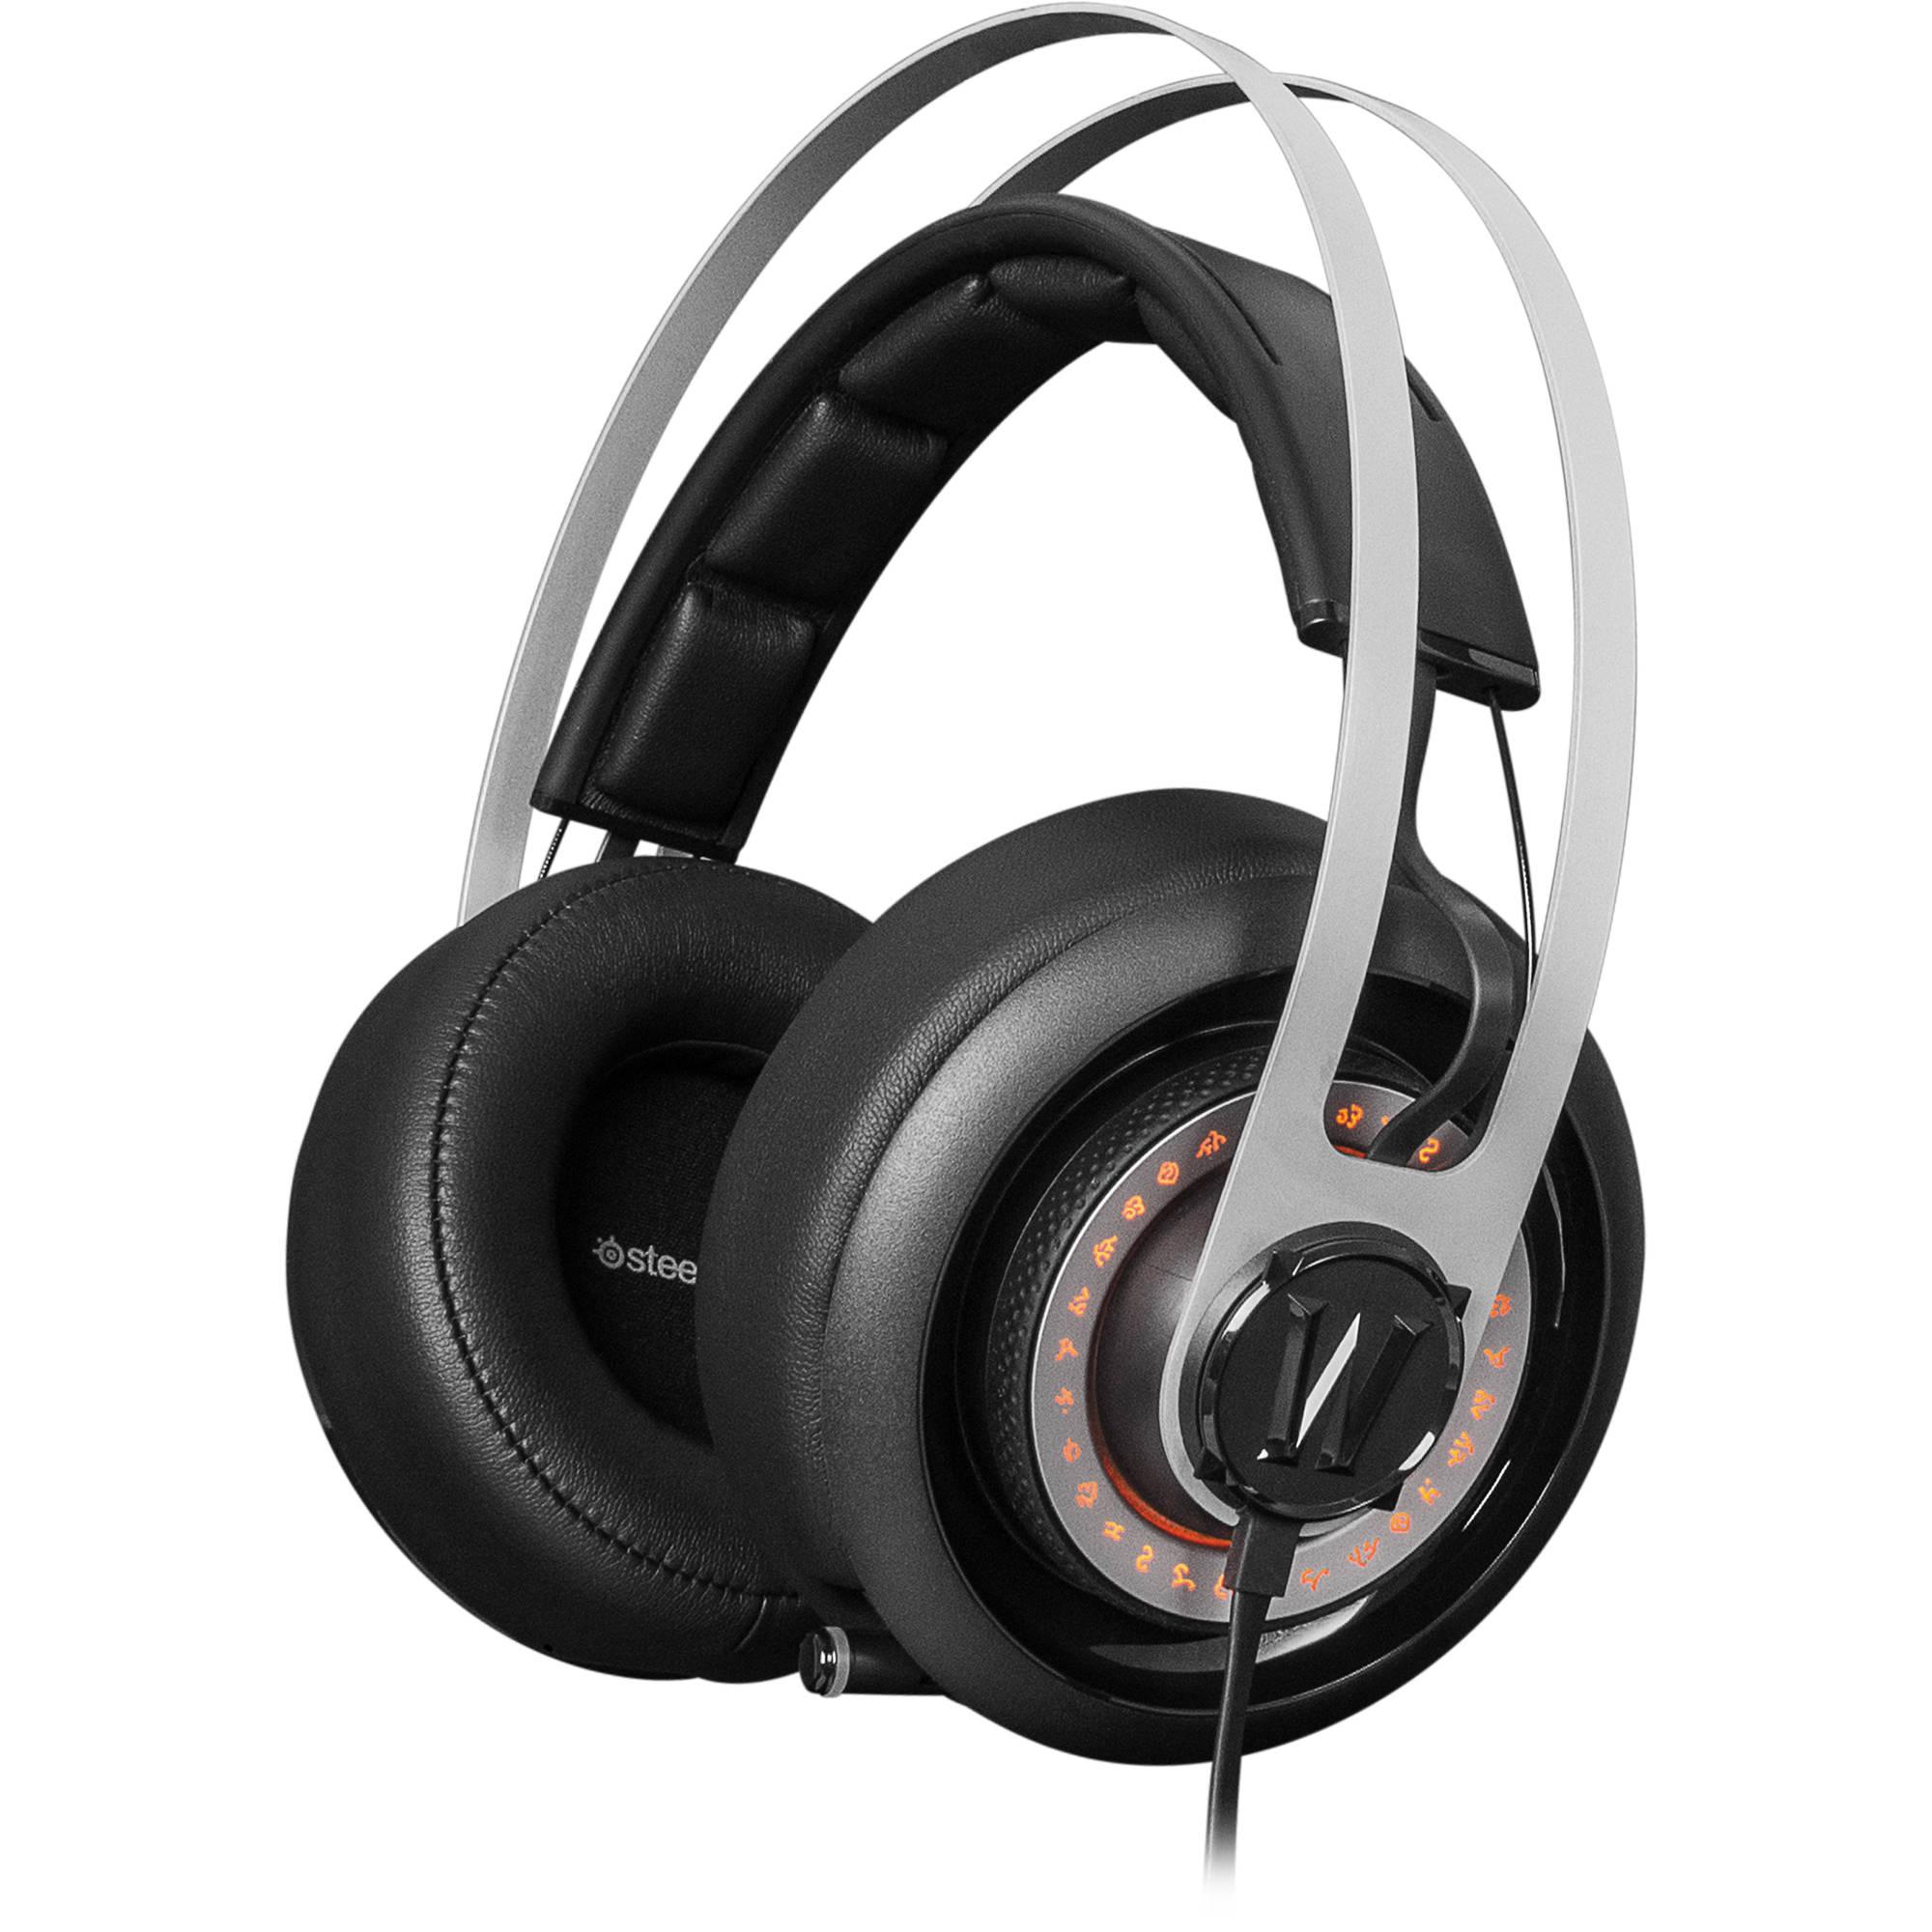 da634aab64e SteelSeries Siberia Elite World of Warcraft Gaming Headset 51154